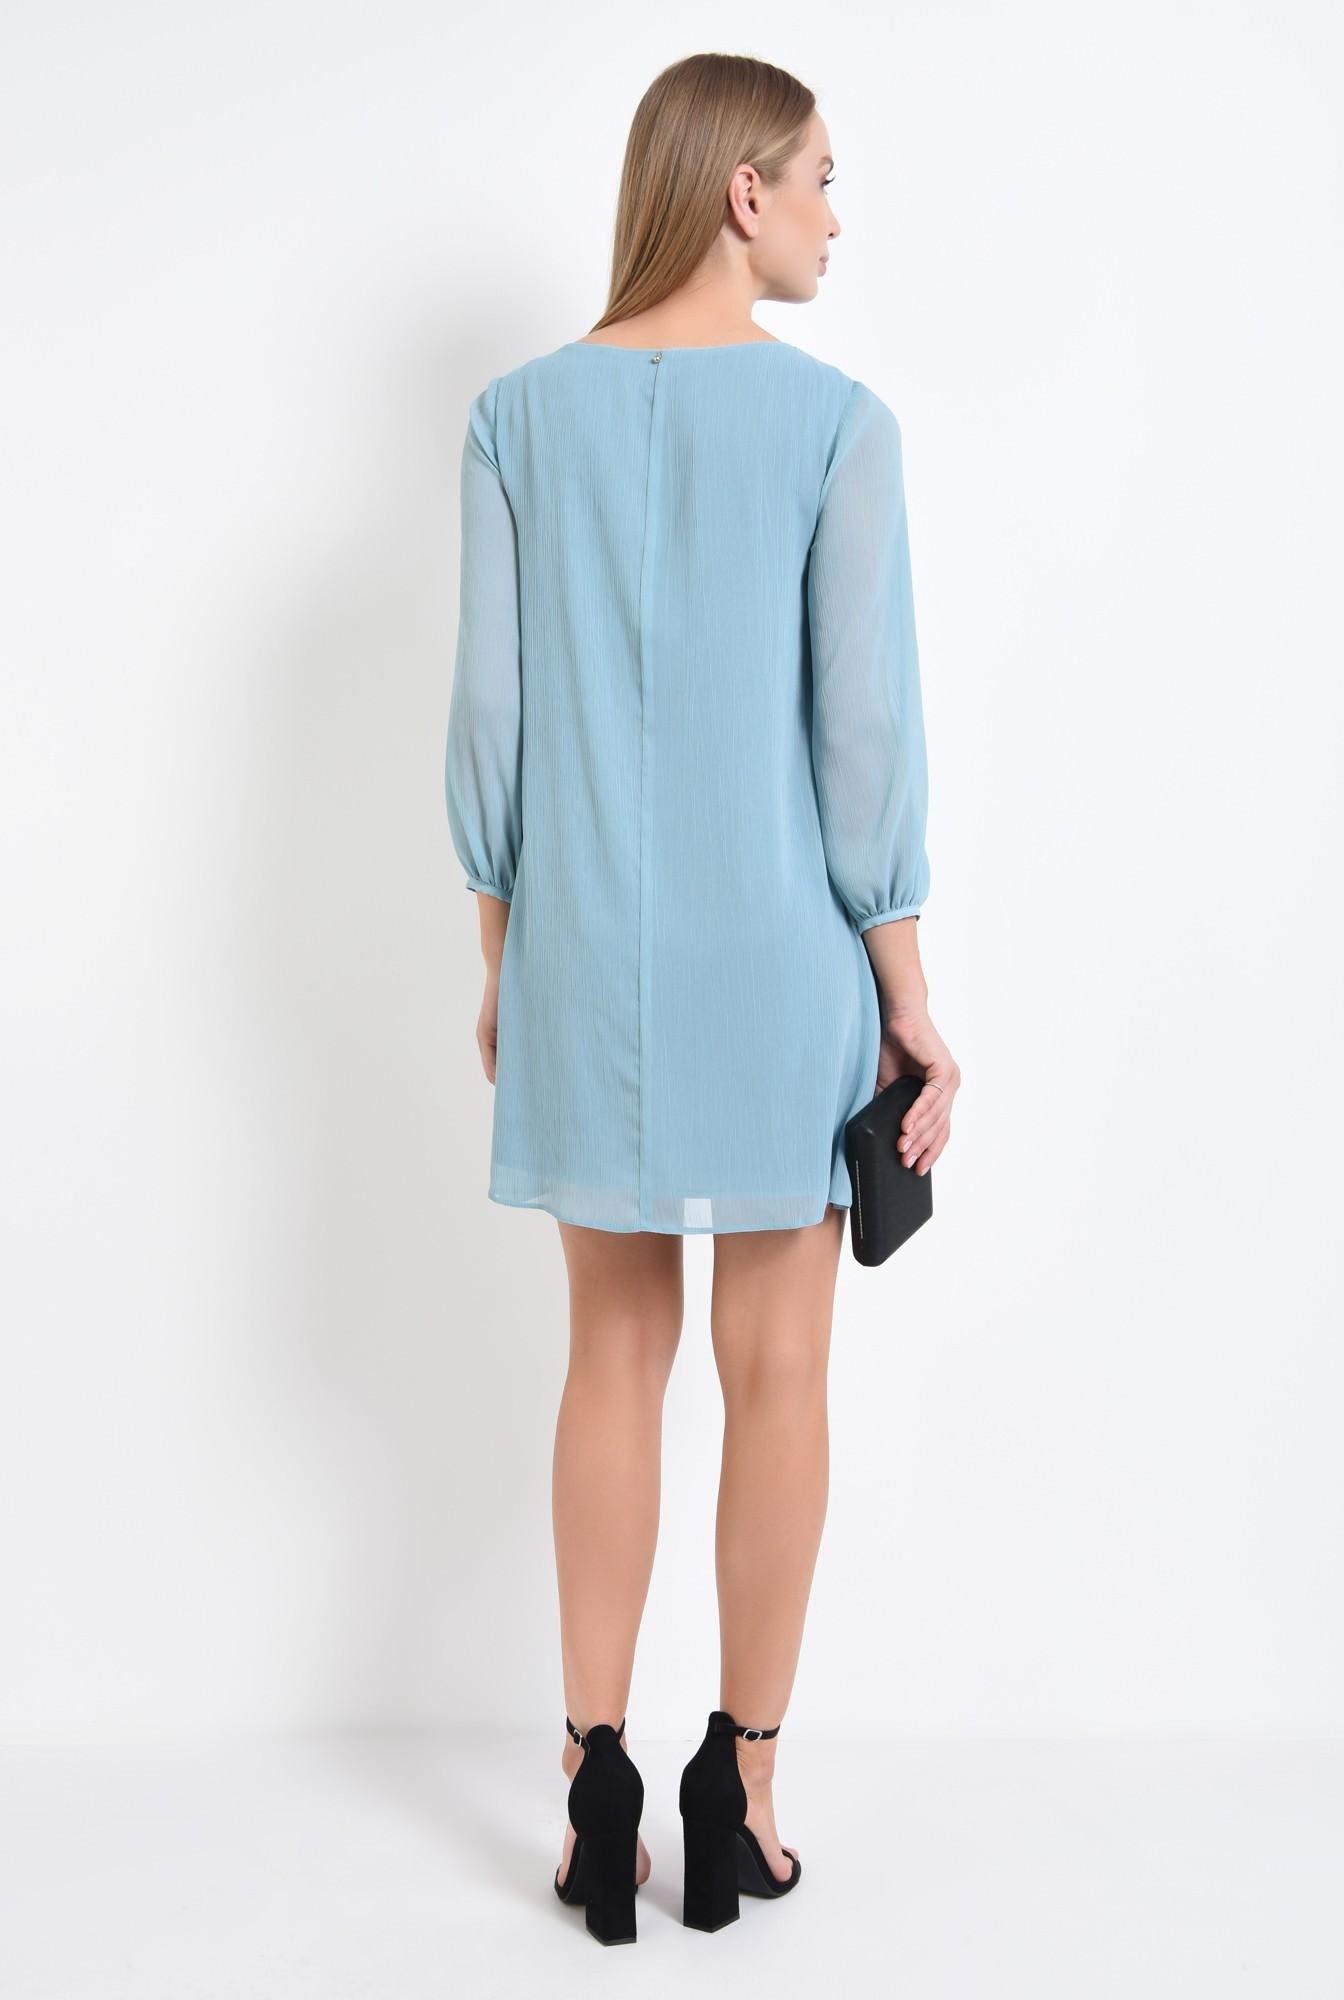 1 - rochie eleganta, bleu, rips, negru, contrast